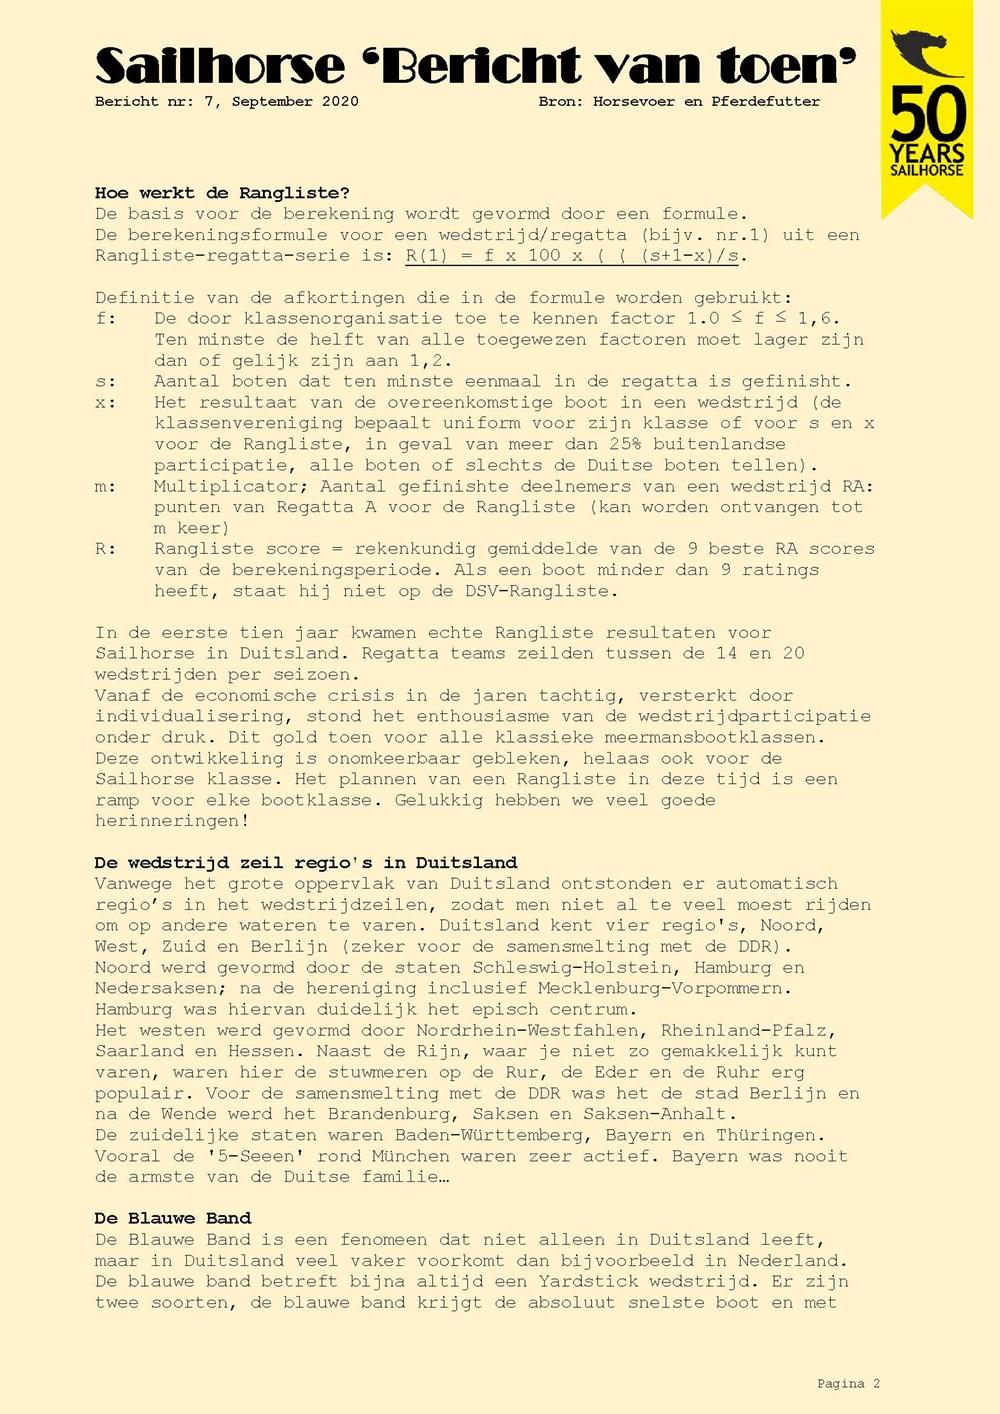 BvT7_Page_2.jpg